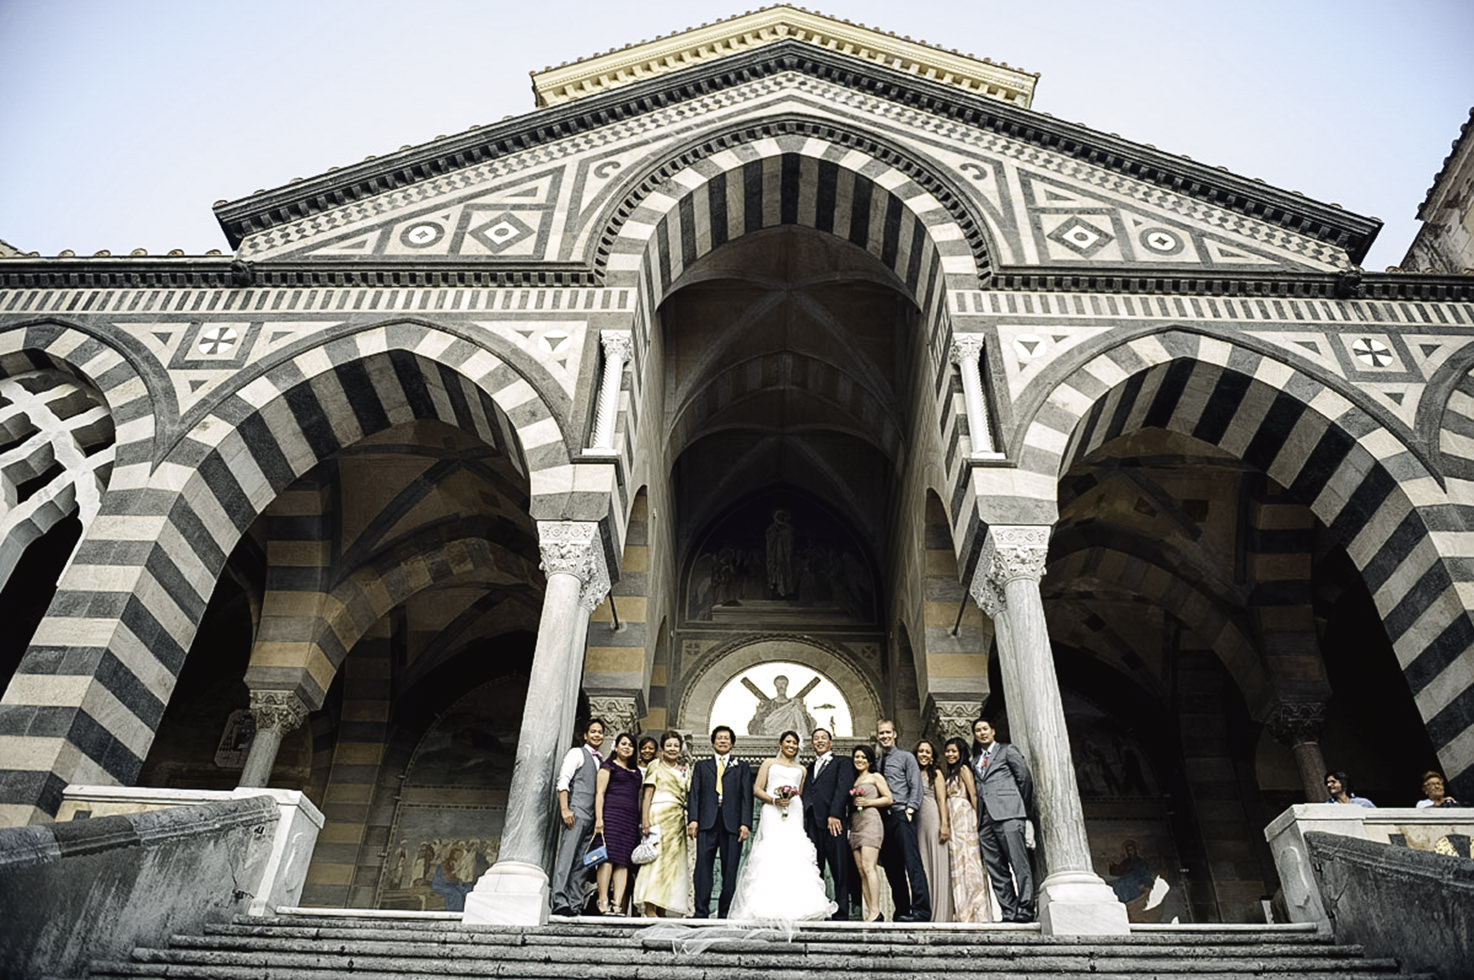 Exterior of Amalfi Duomo